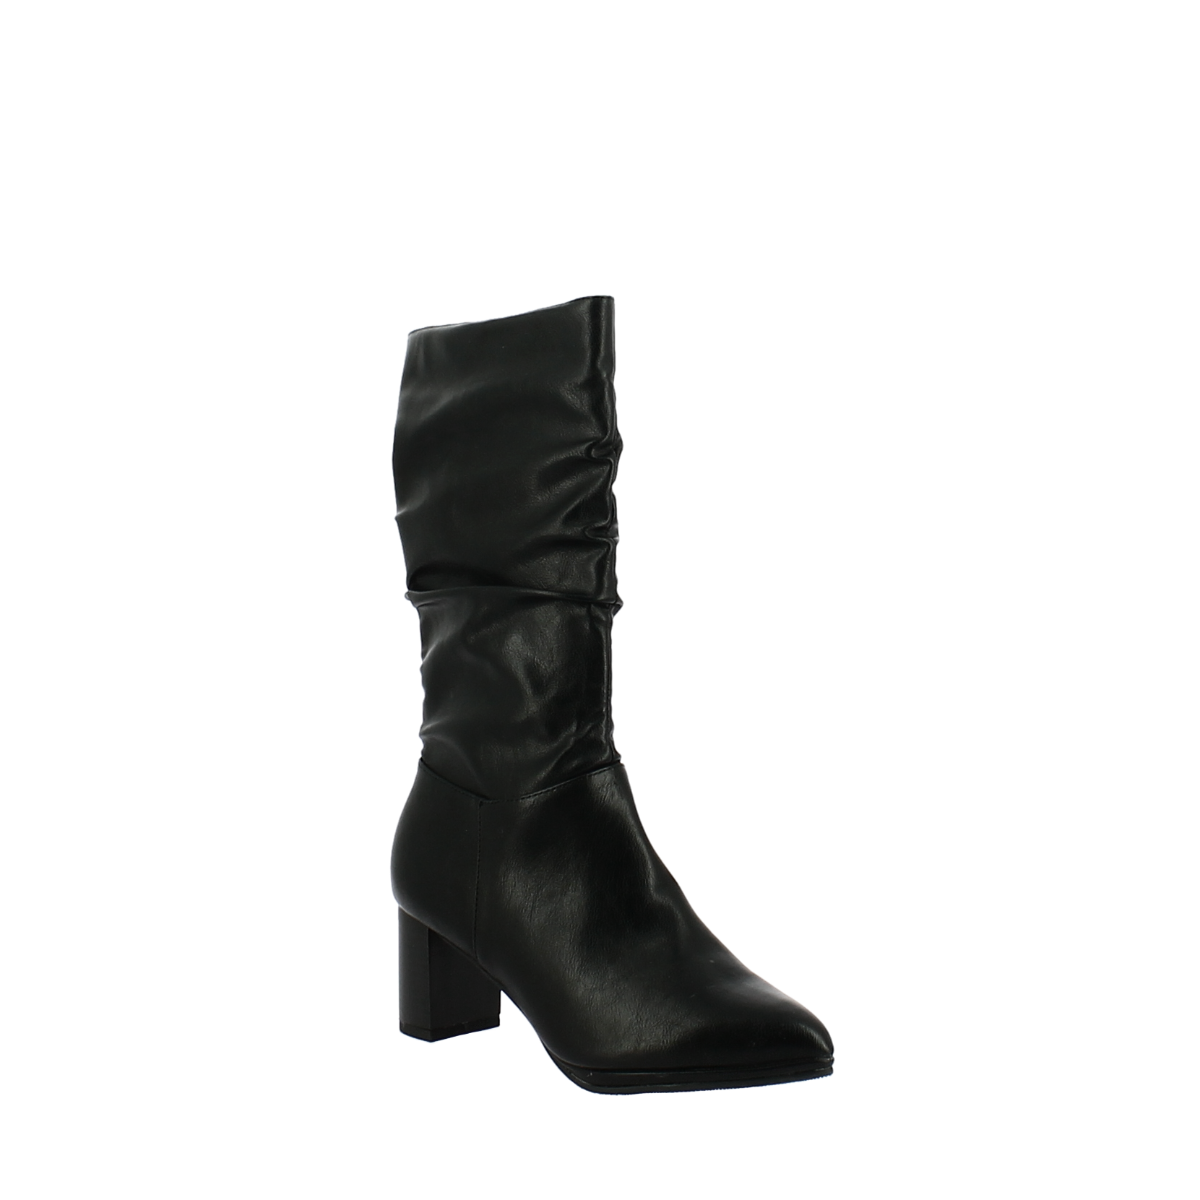 BALLERI Γυναικεία Μπότα 19 BL204-2A Μαύρο - Μαύρο - 19 BL204-2A BLACK-black-36/4/1/81